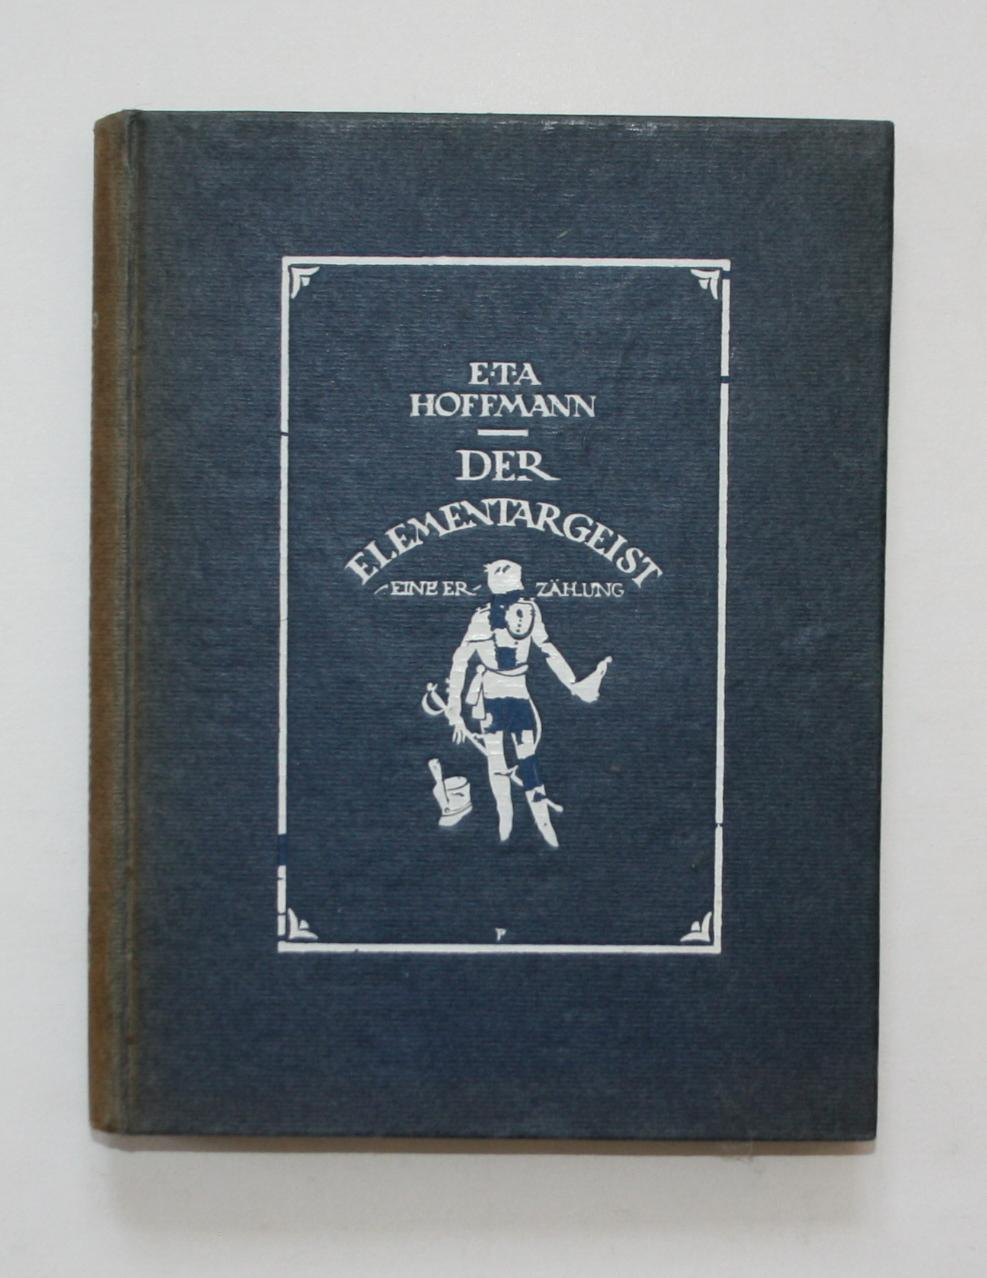 Der Elementargeist.: Hoffmann, E. T.